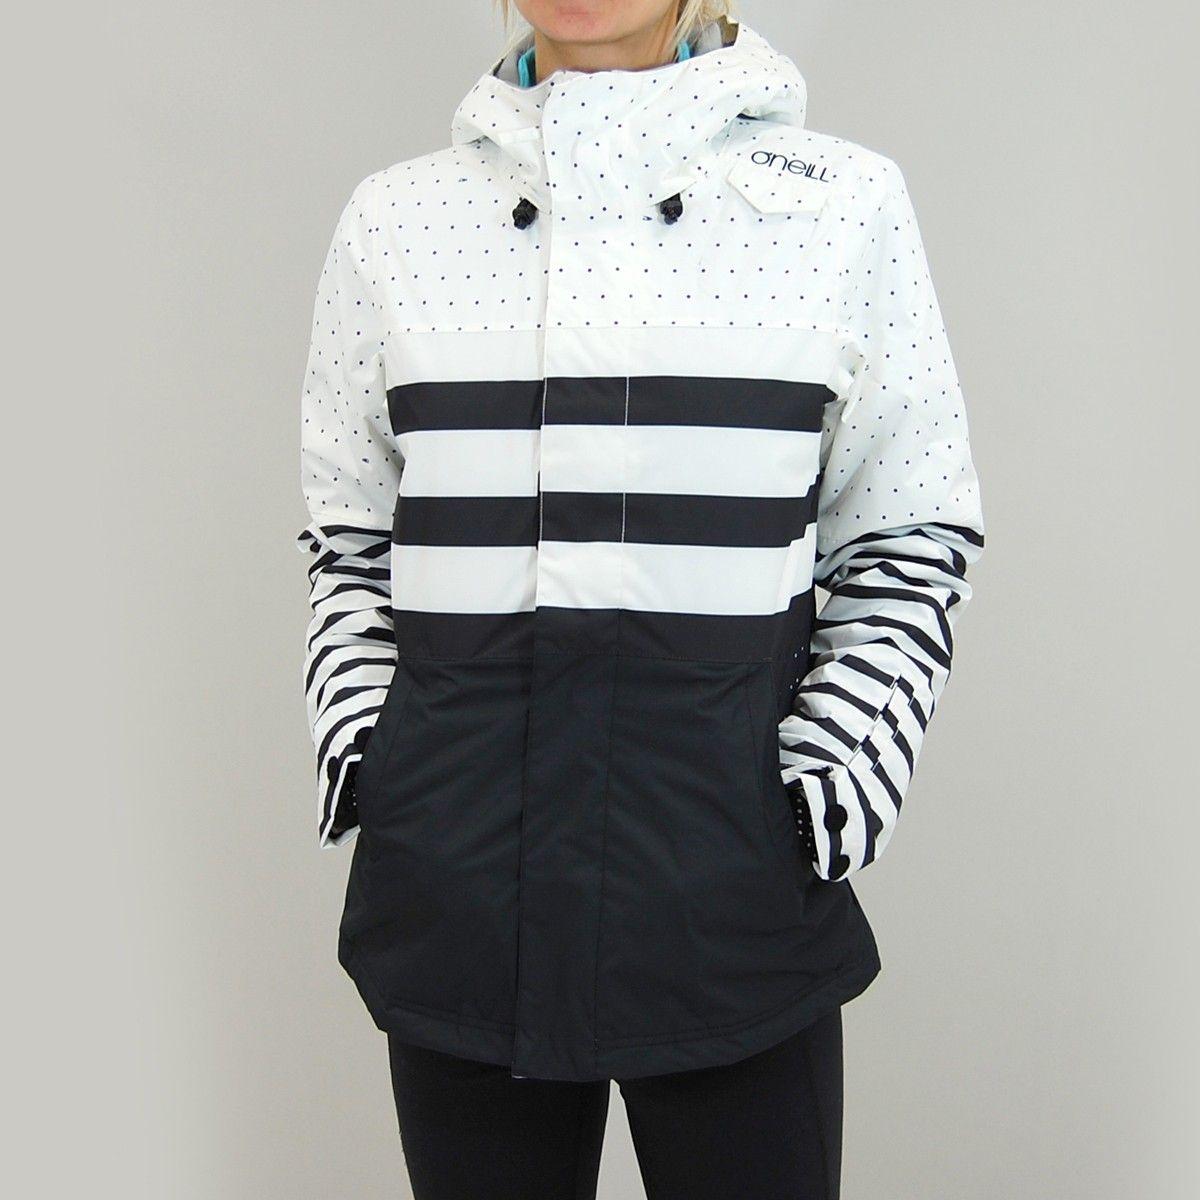 O Neill Escape Kayanite Women S Ski Jacket The Outdoor